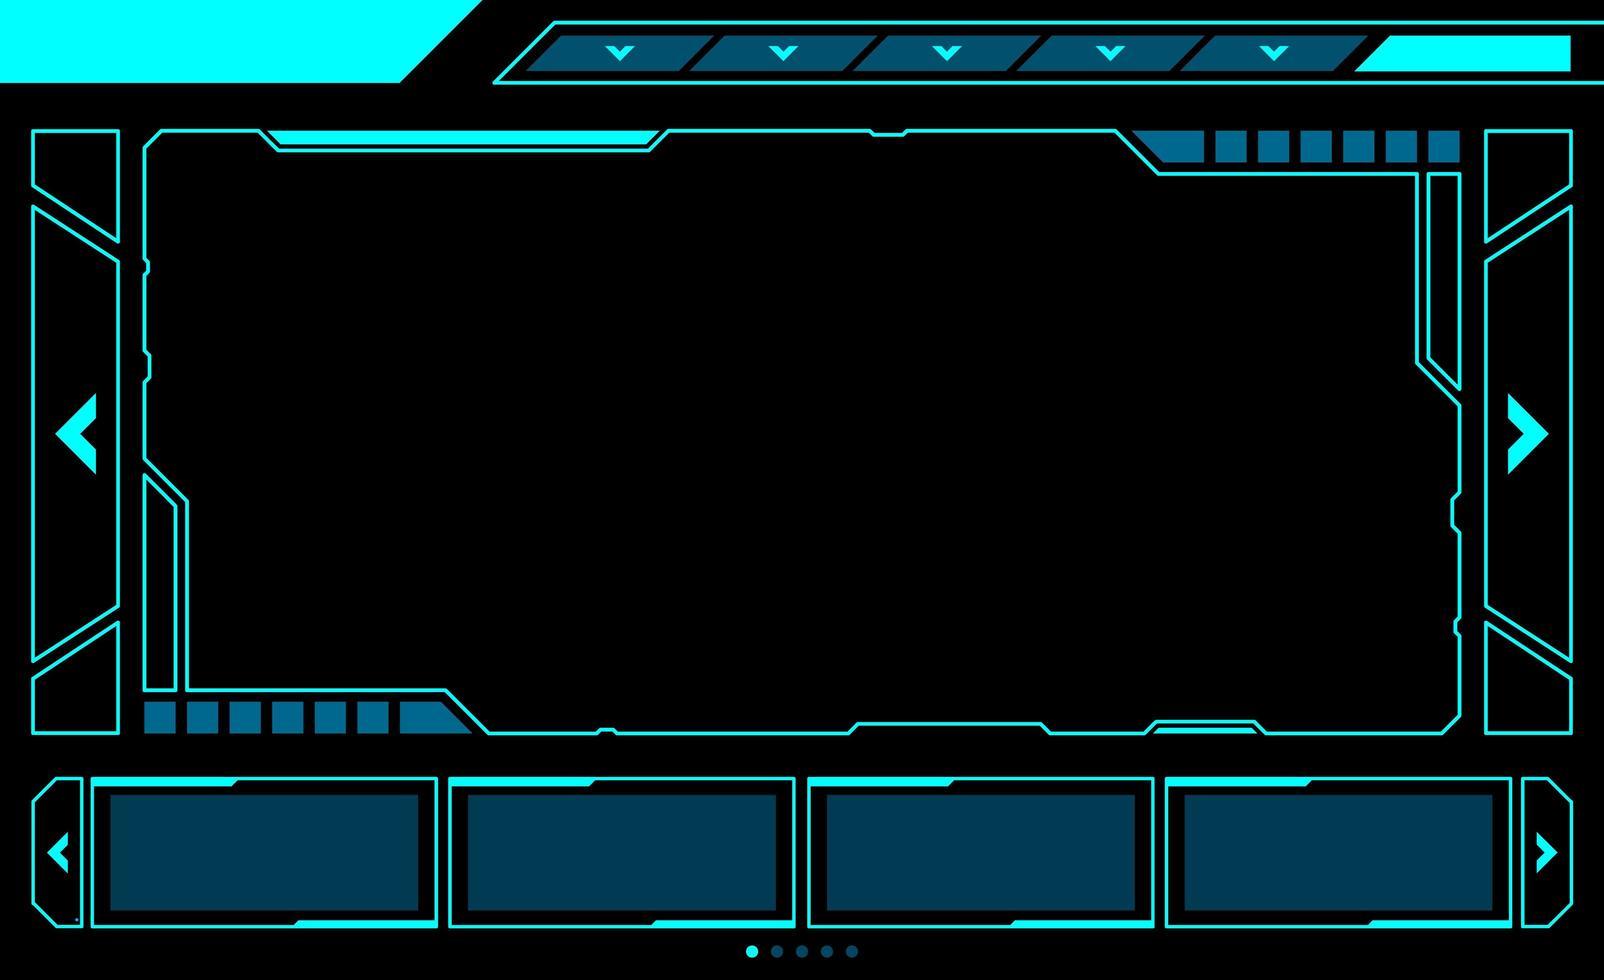 gran ventana rectangular interfaz hud vector